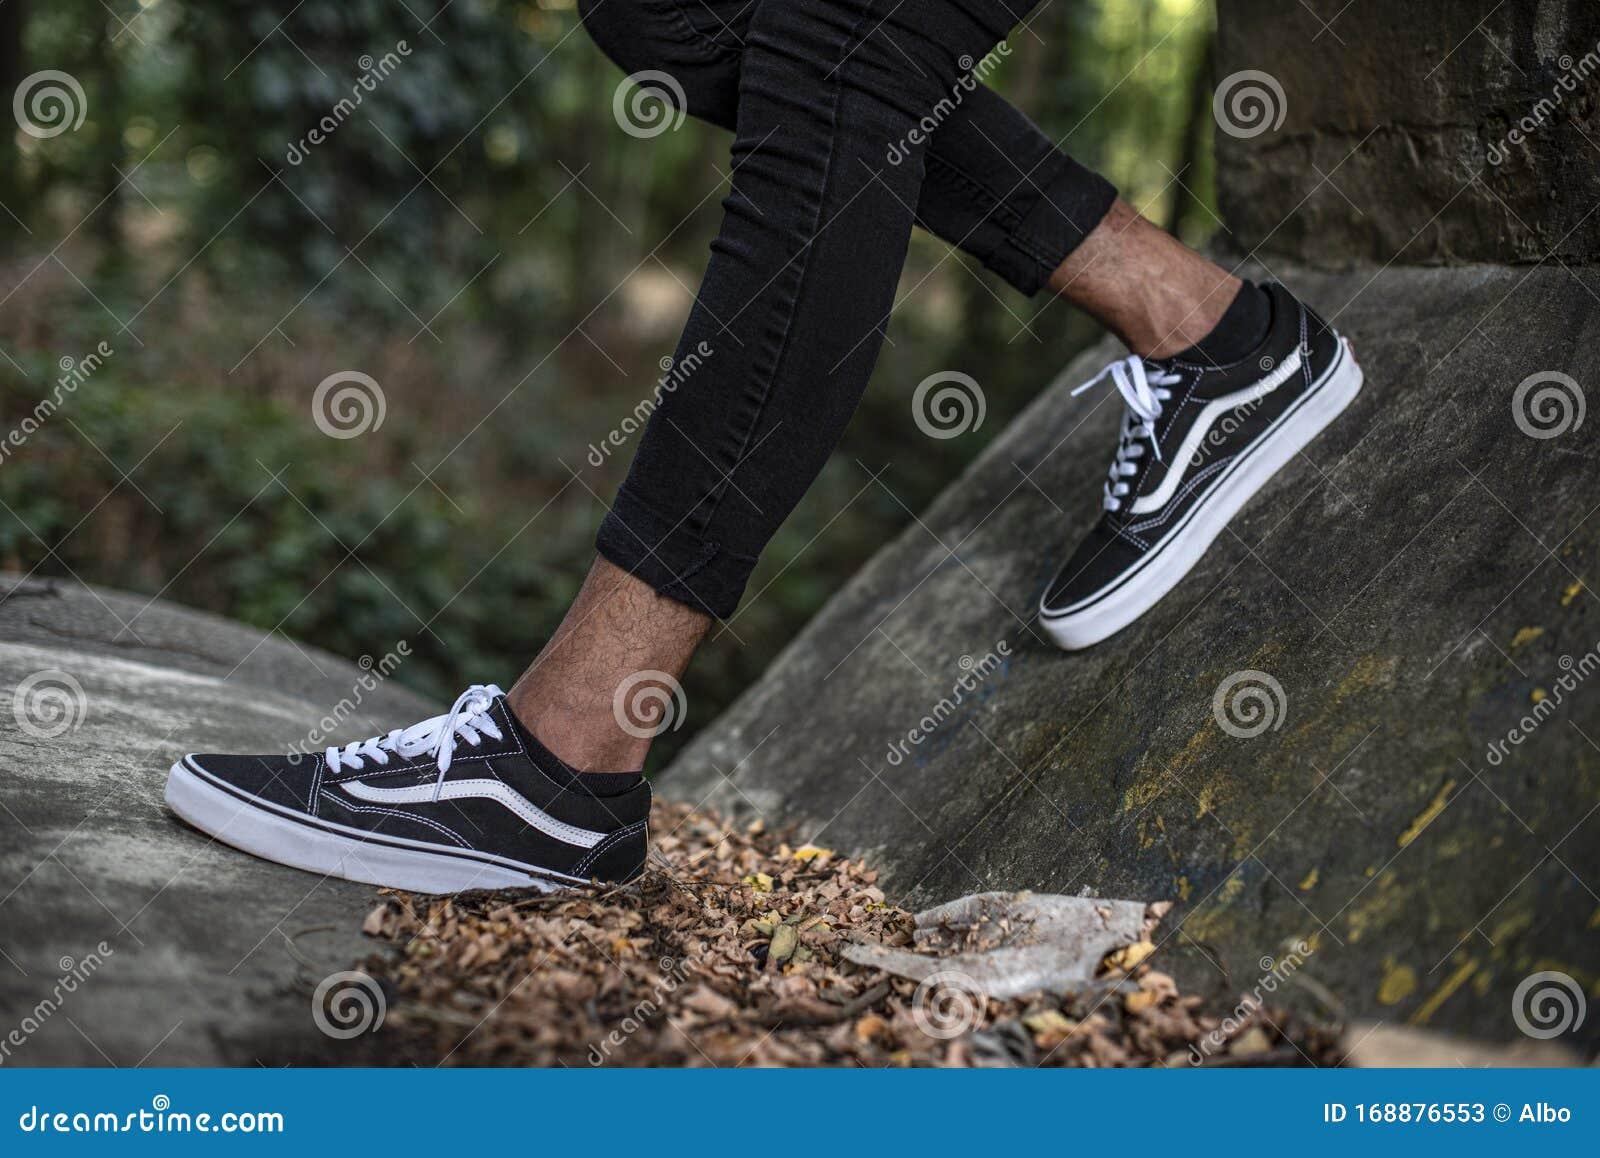 vans uomo running